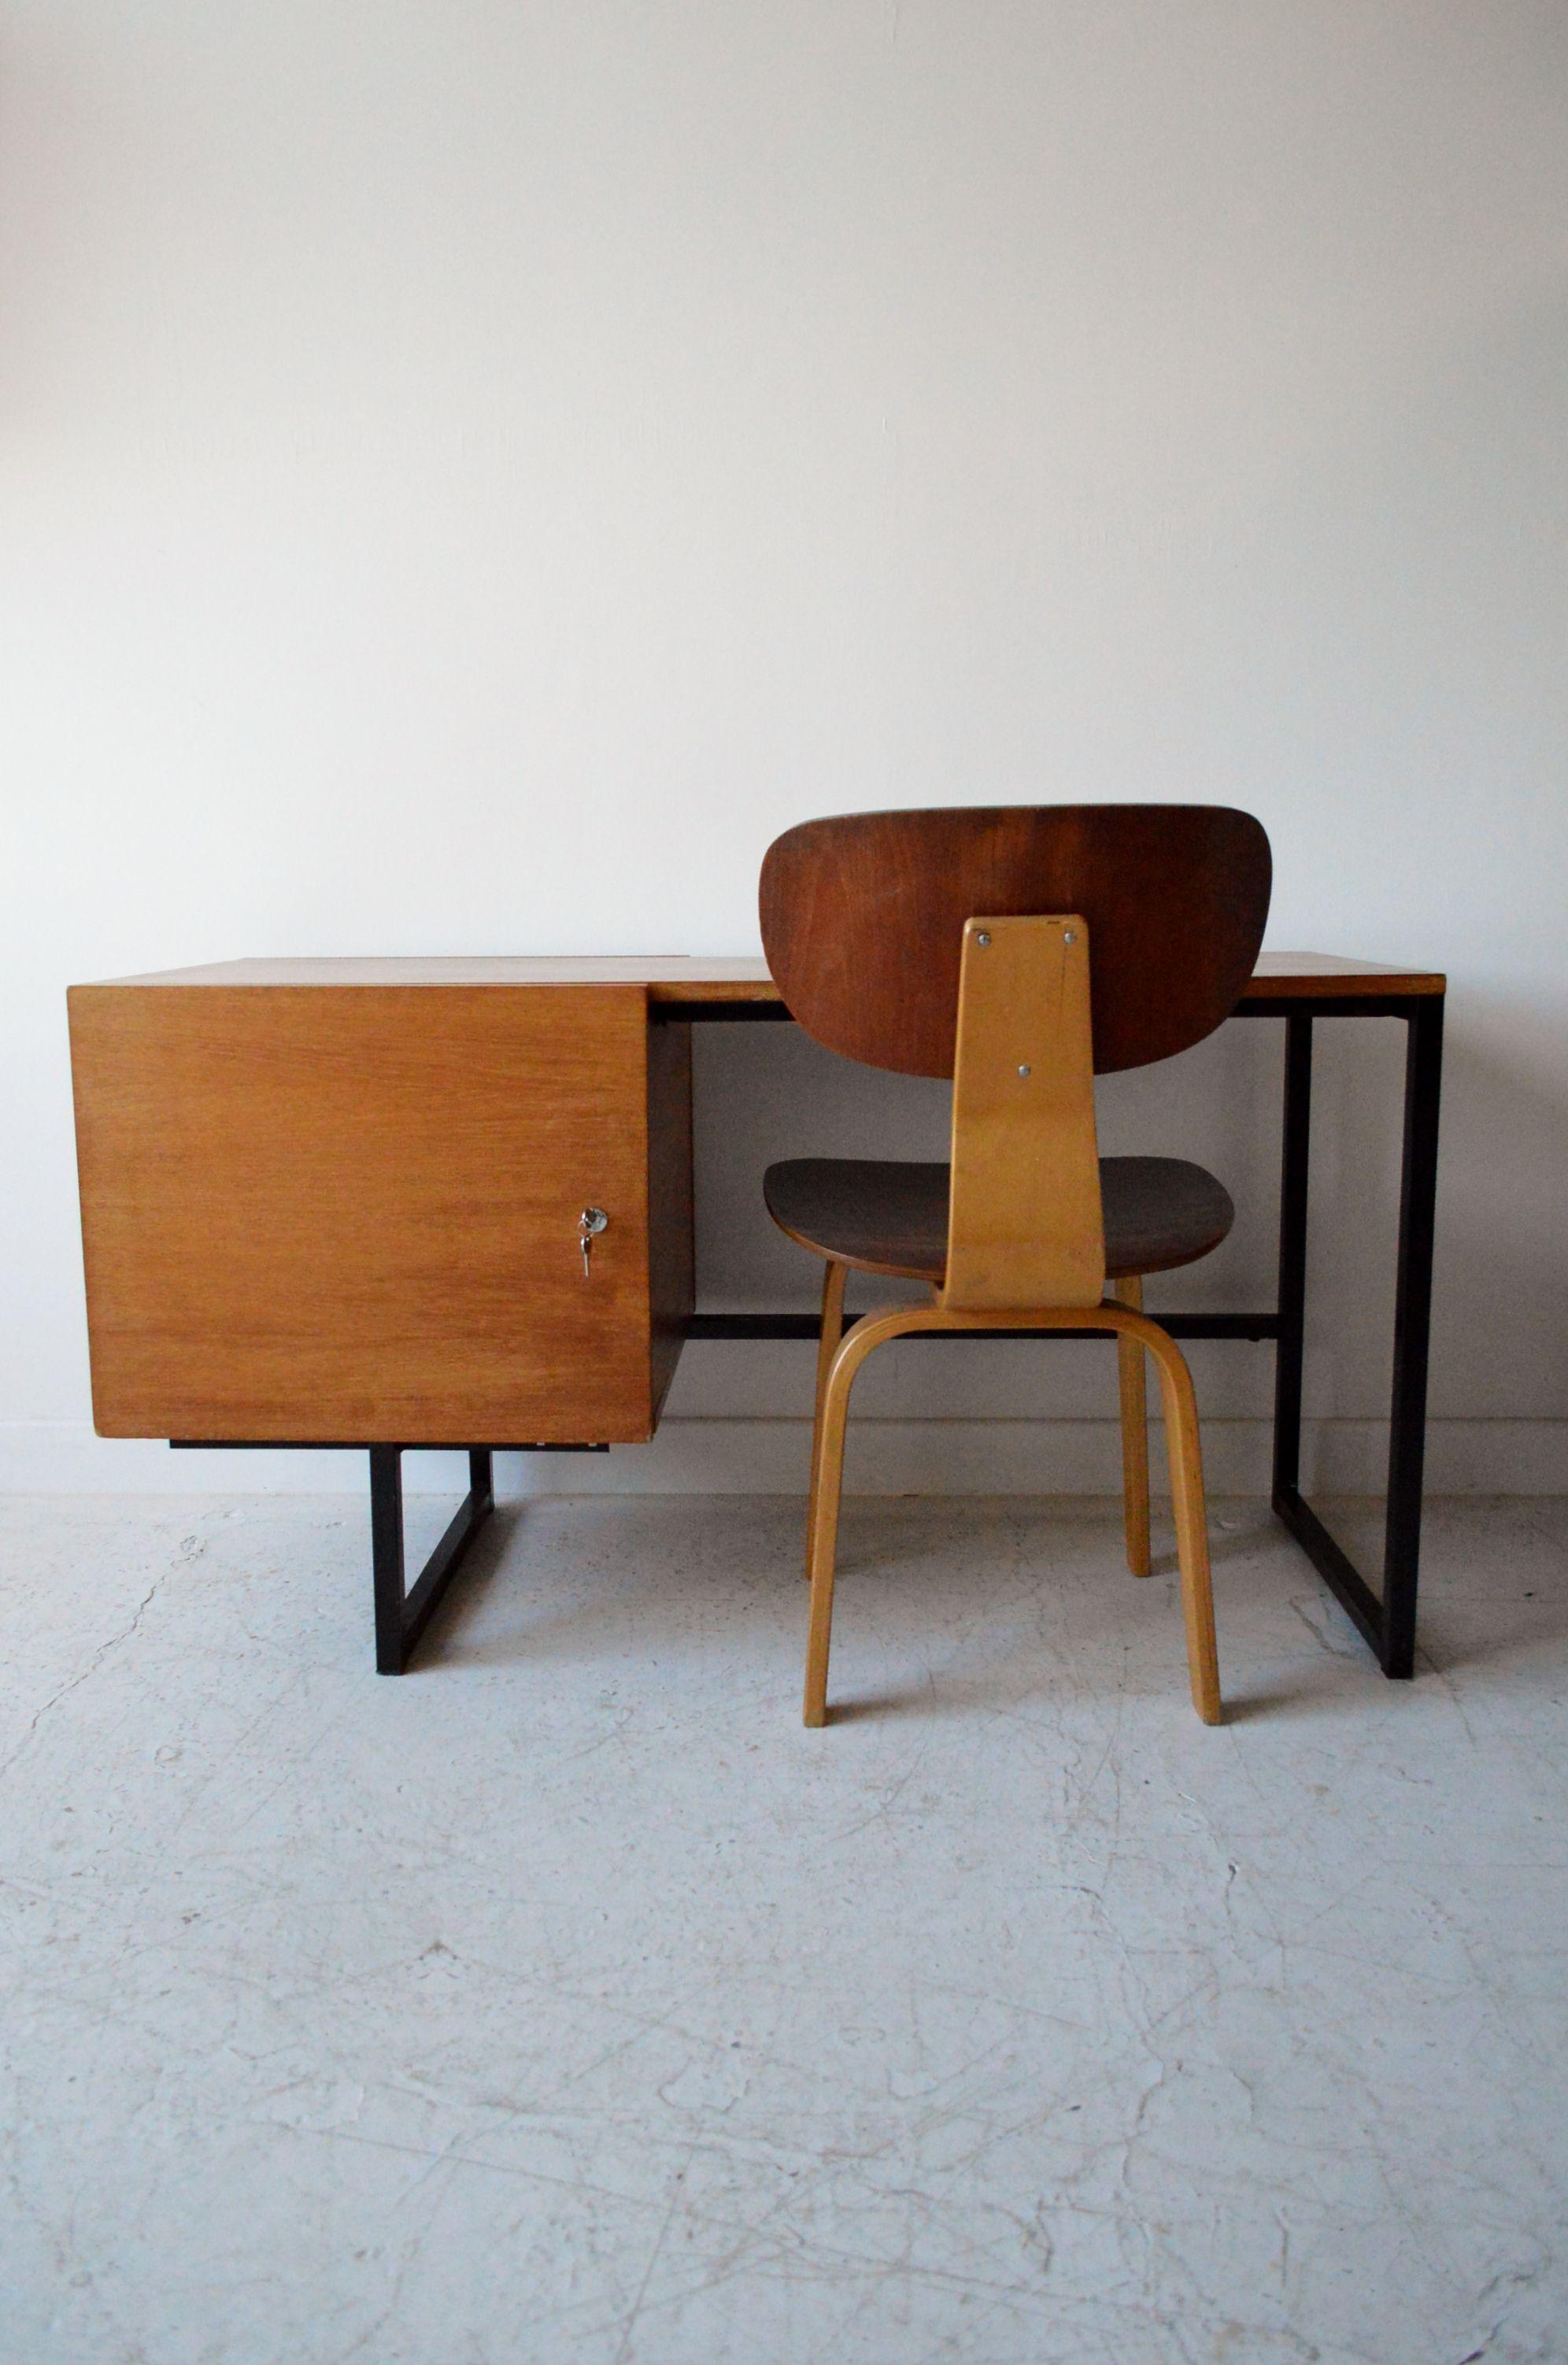 Guariche style 1960s Dutch desk, from www.osimodern.com #midcentury #desk